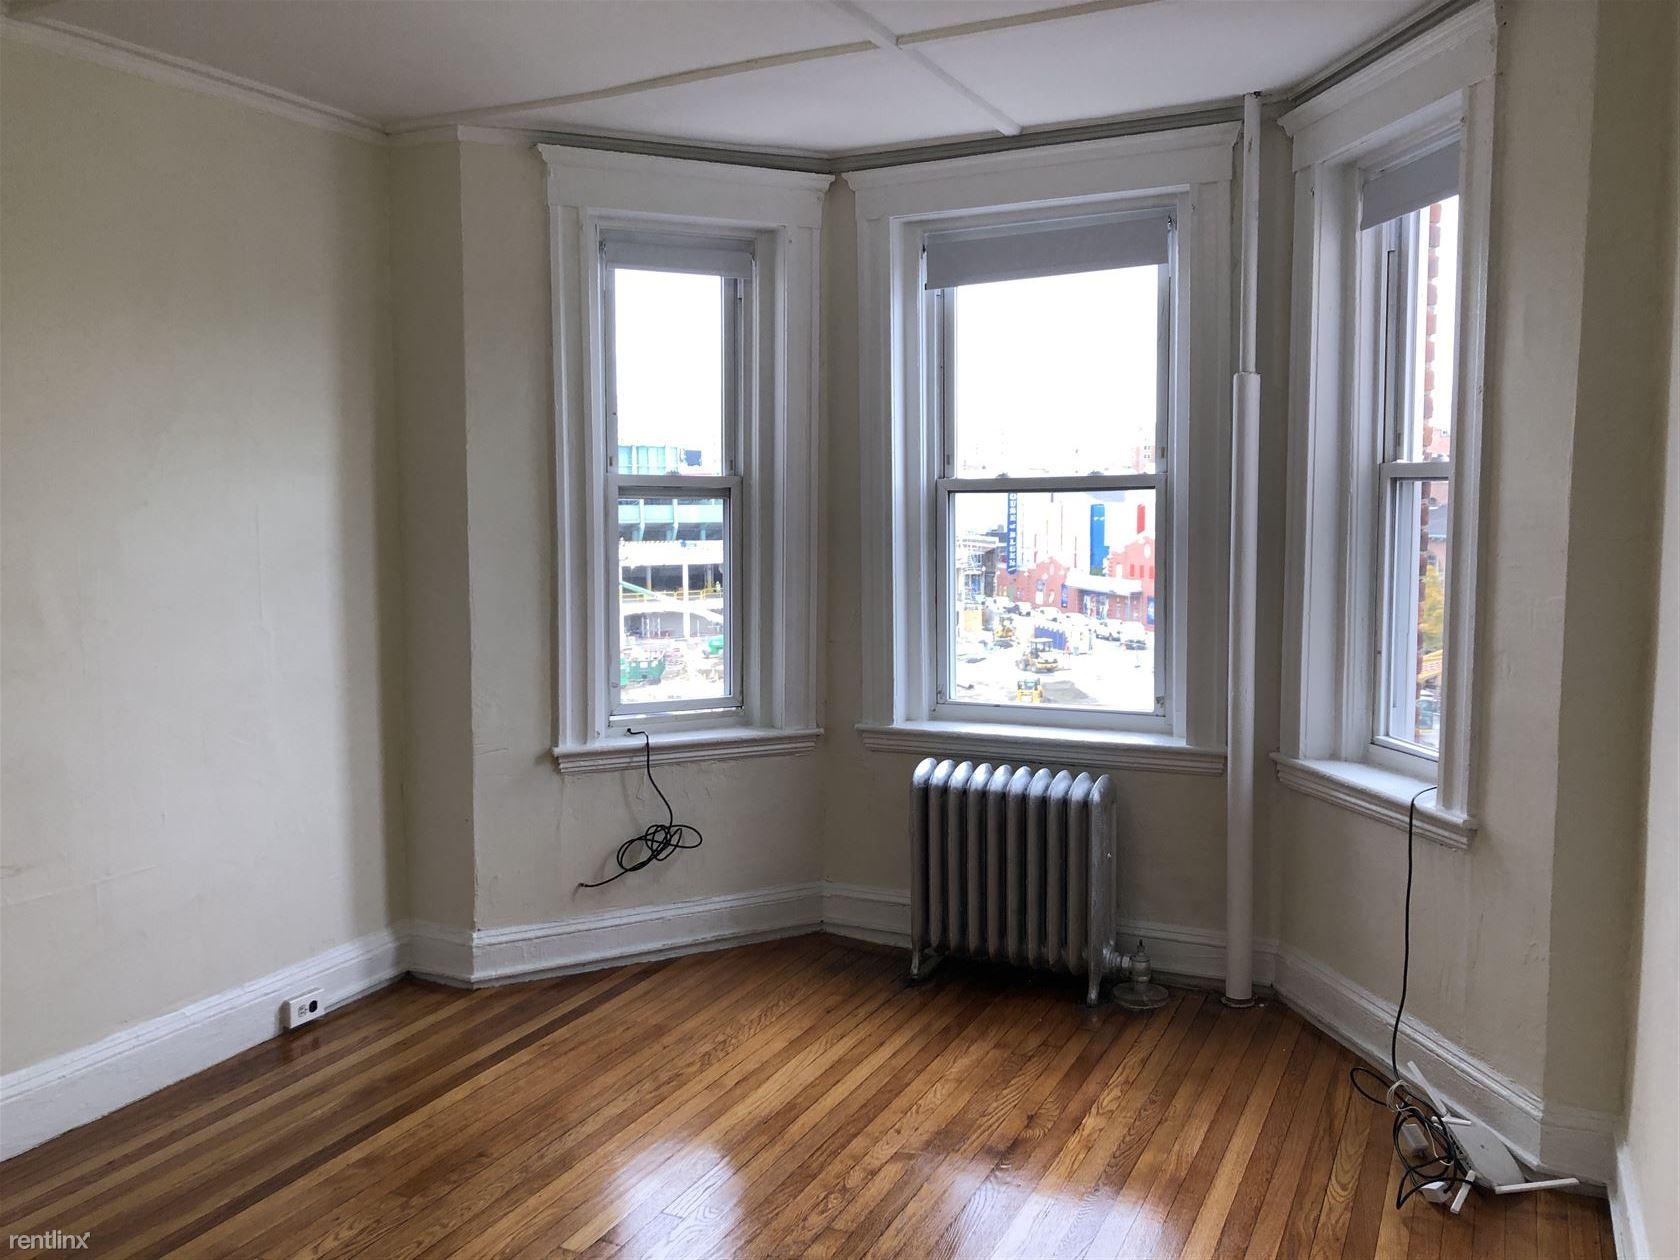 1175 Boylston St Apt 34, Boston, MA - 1,475 USD/ month